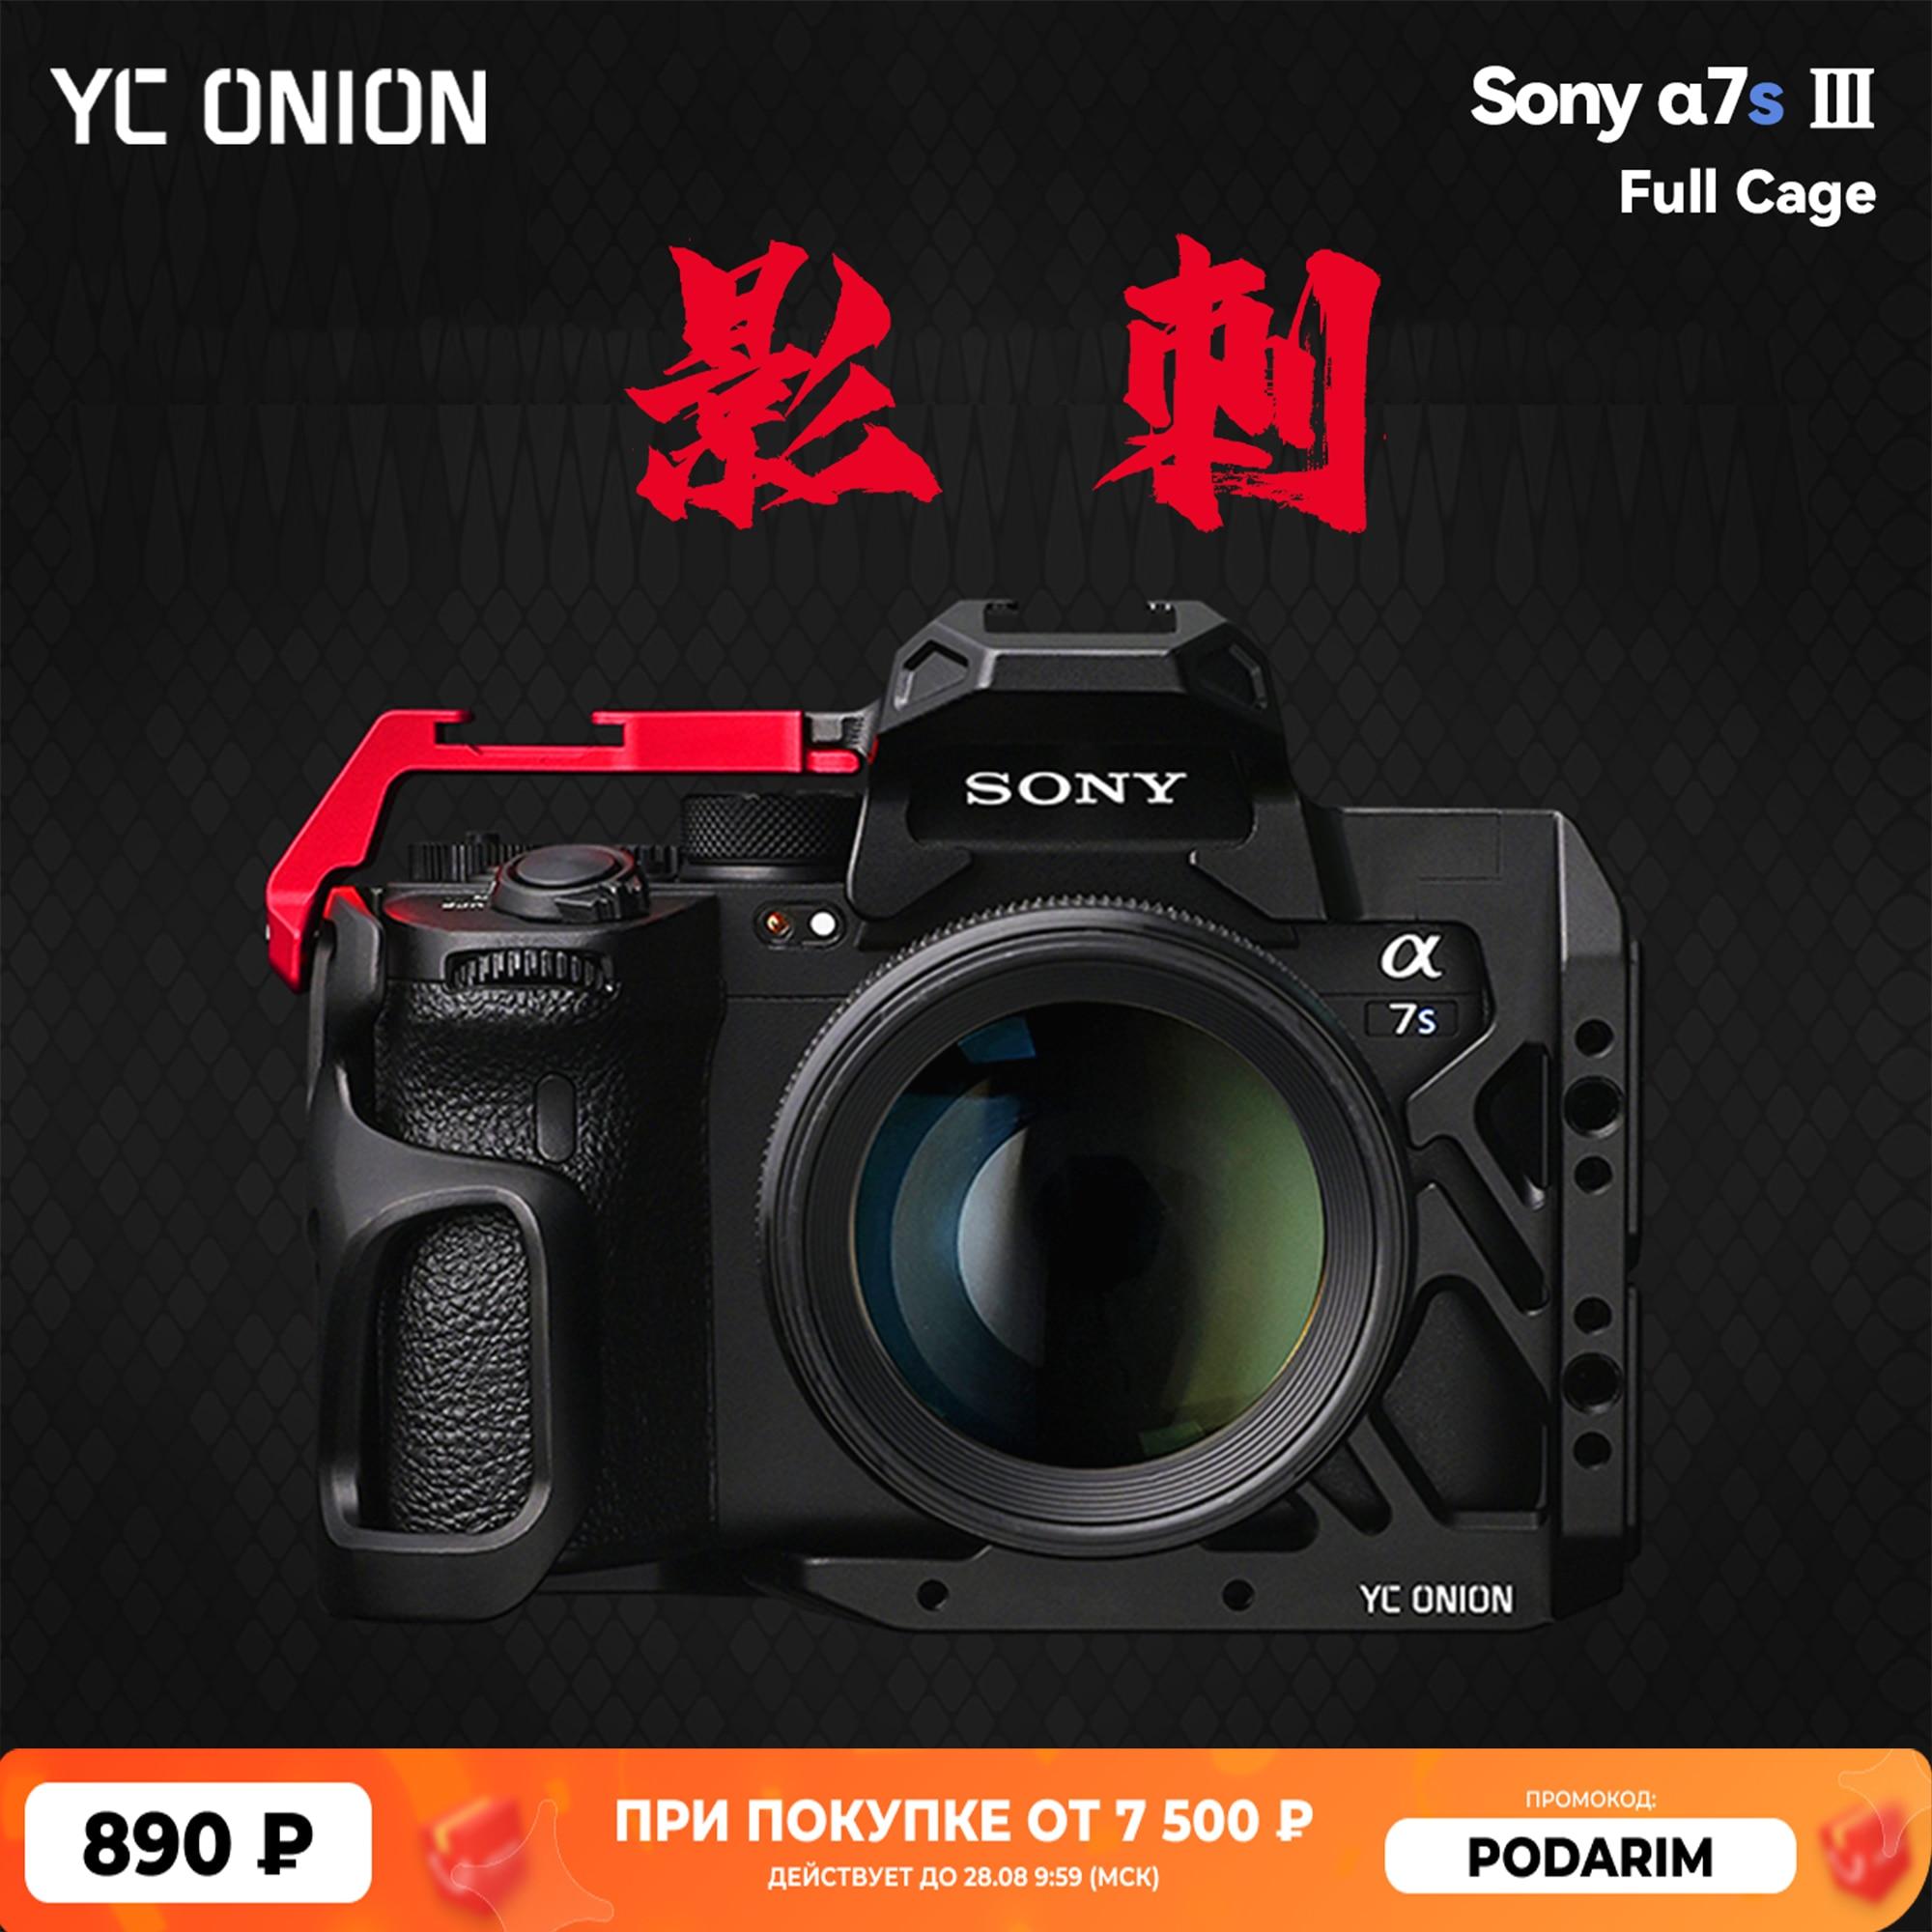 YC بصل سوني A7S3 كاميرا قفص كامل مع حذاء بارد 1/4 متعدد جبل A7M3 A7R4 نصف قفص سبائك الألومنيوم formfit واقية